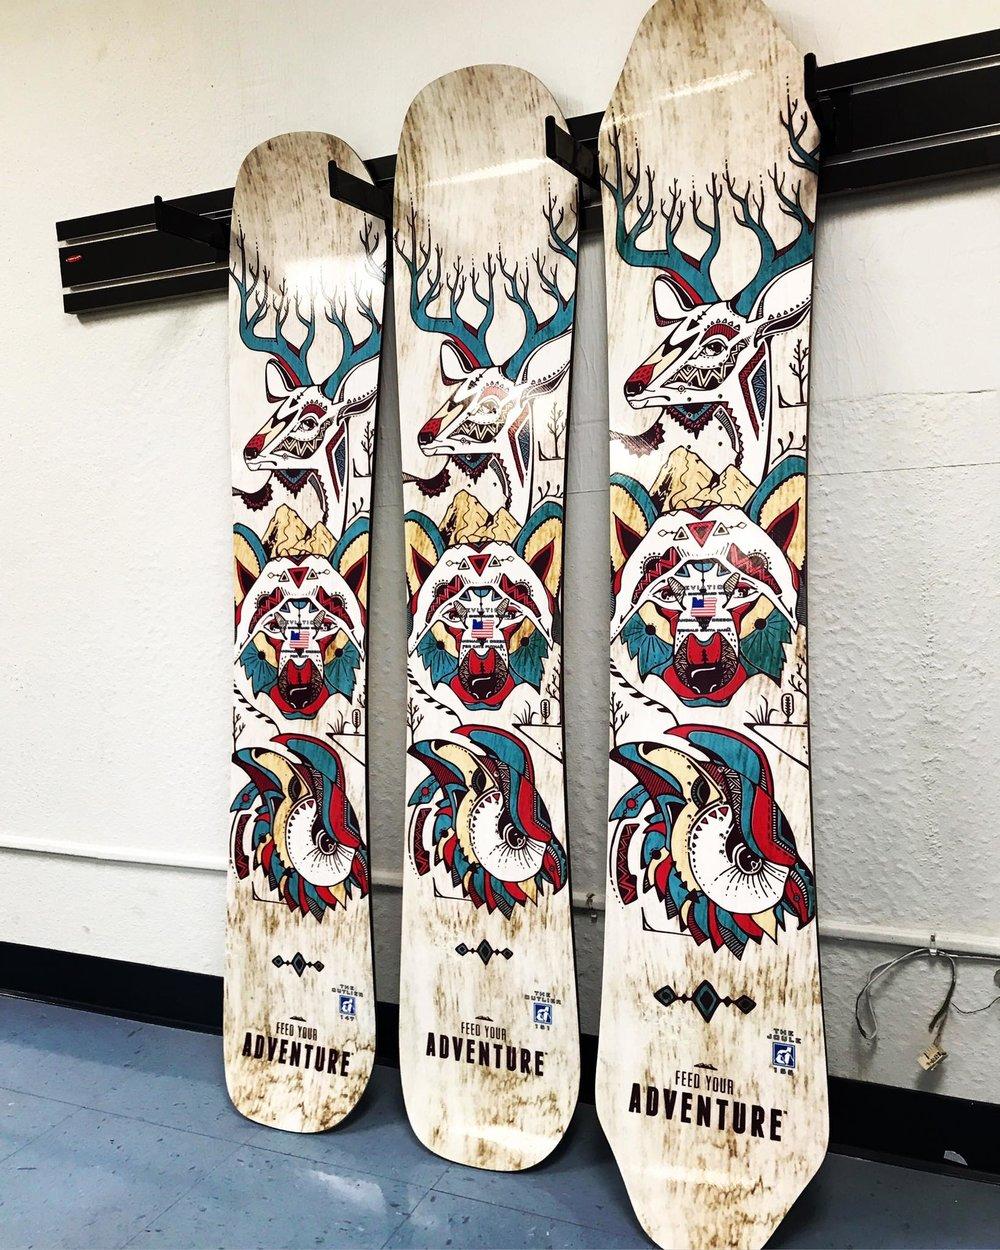 ed1f518ba44e Handmade Snowboards - 21 Best Handmade Snowboard Brands — ReddyYeti